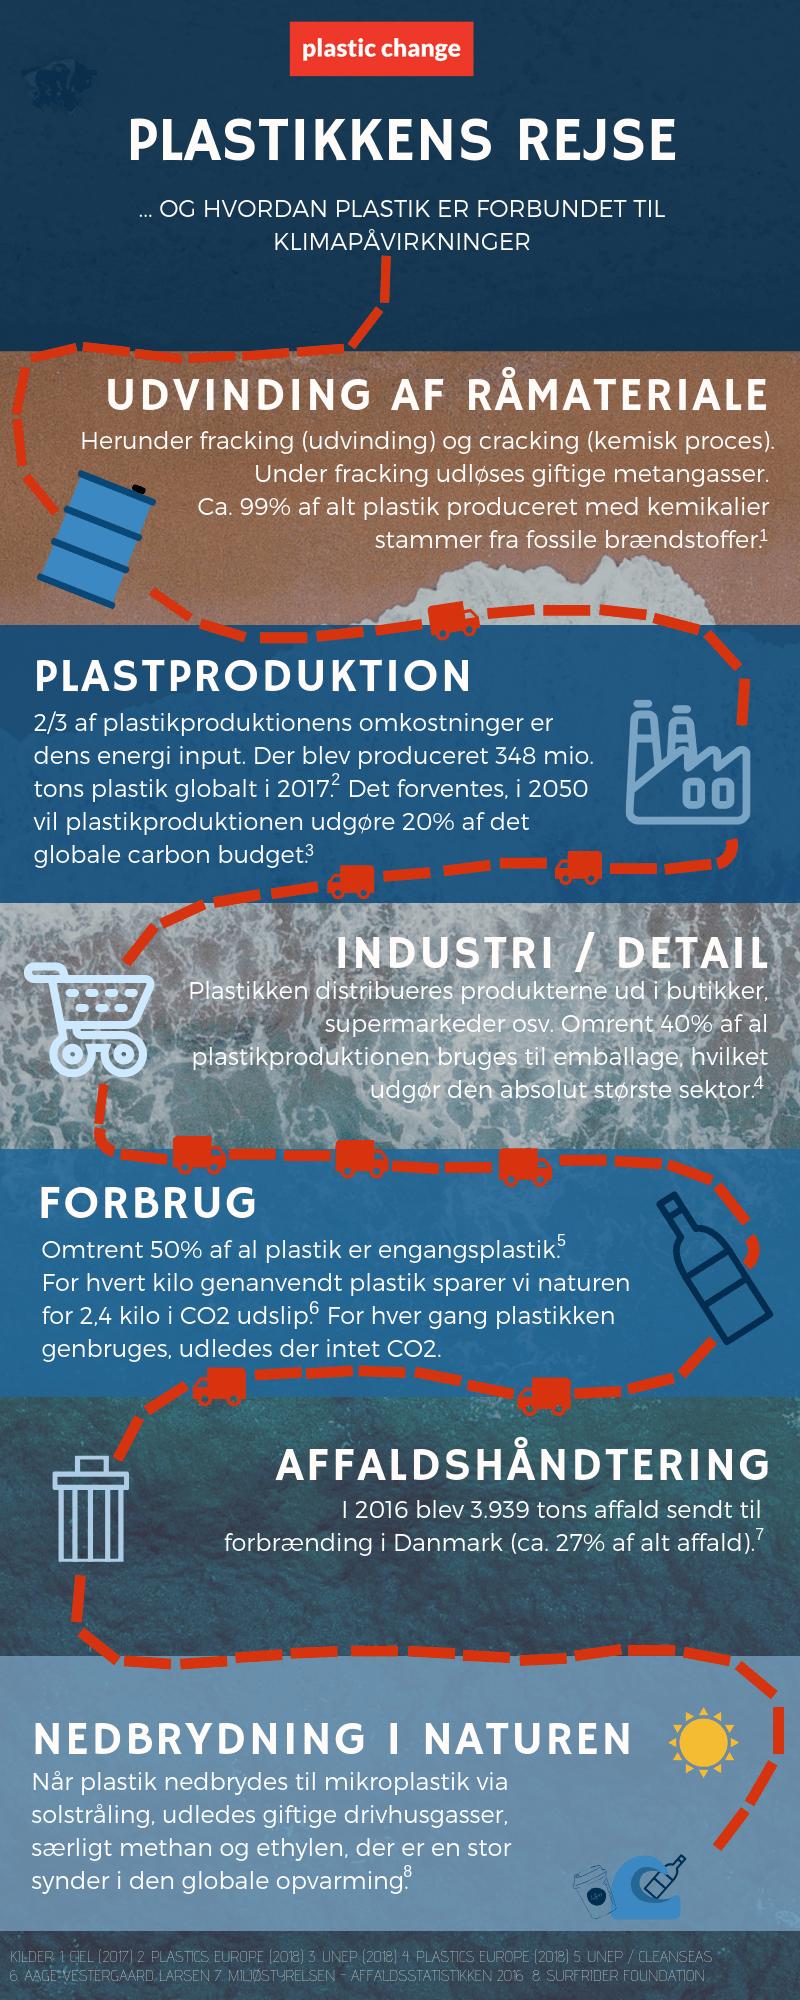 e655f904c95 Plastik og Klima - Plastic Change : Plastic Change